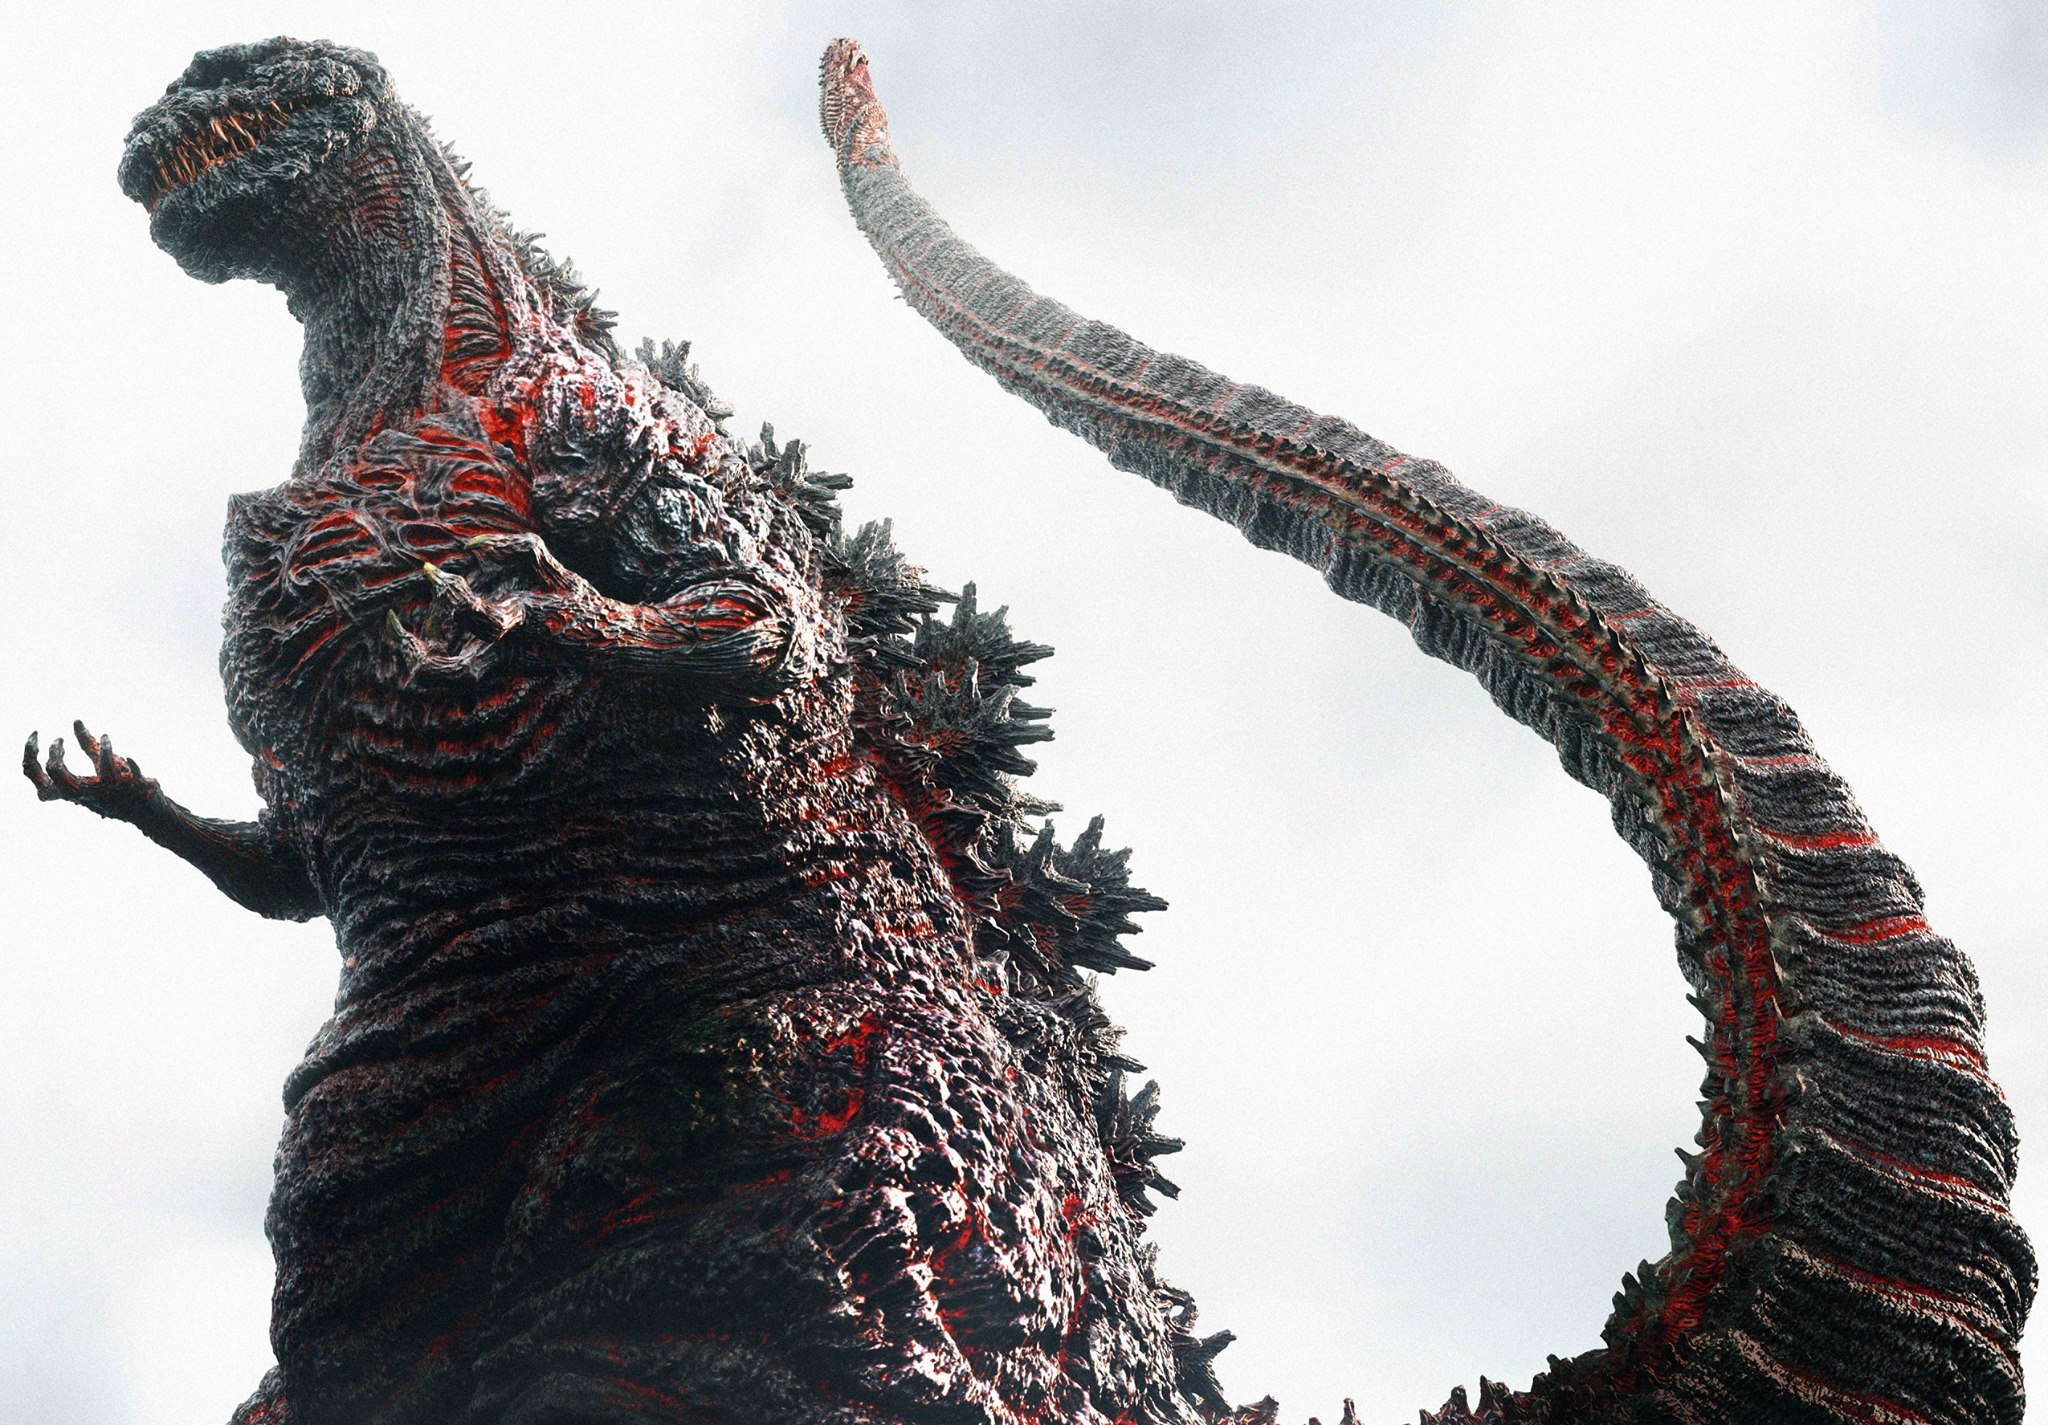 Shin Godzilla Full Wallpaper by godzilla-image on DeviantArt